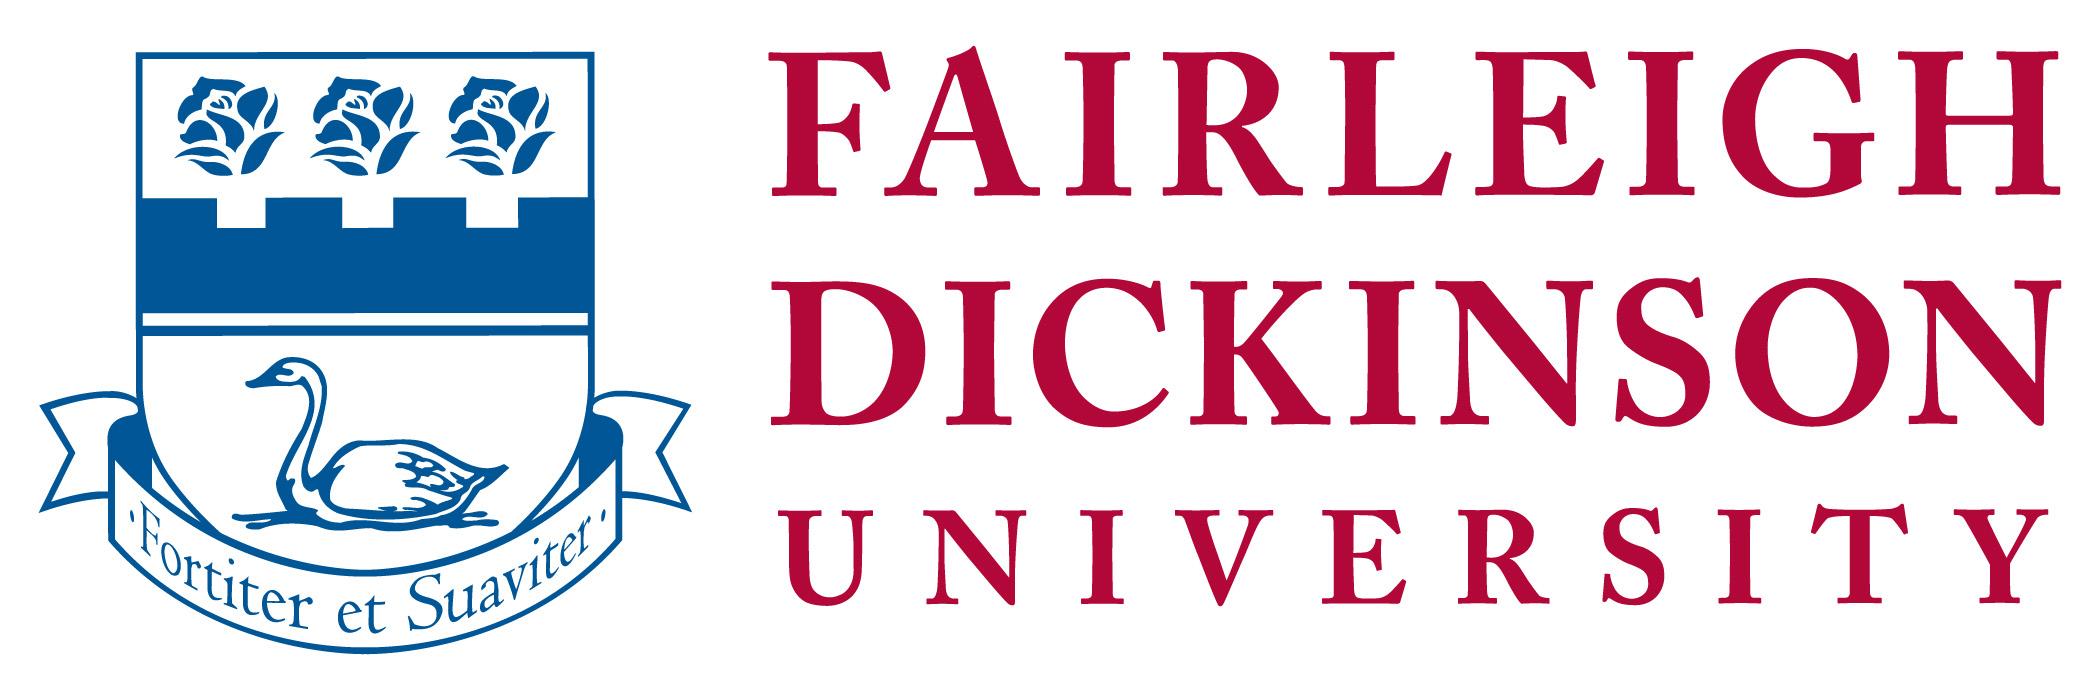 Fairleigh-Dickinson-University-logo-page